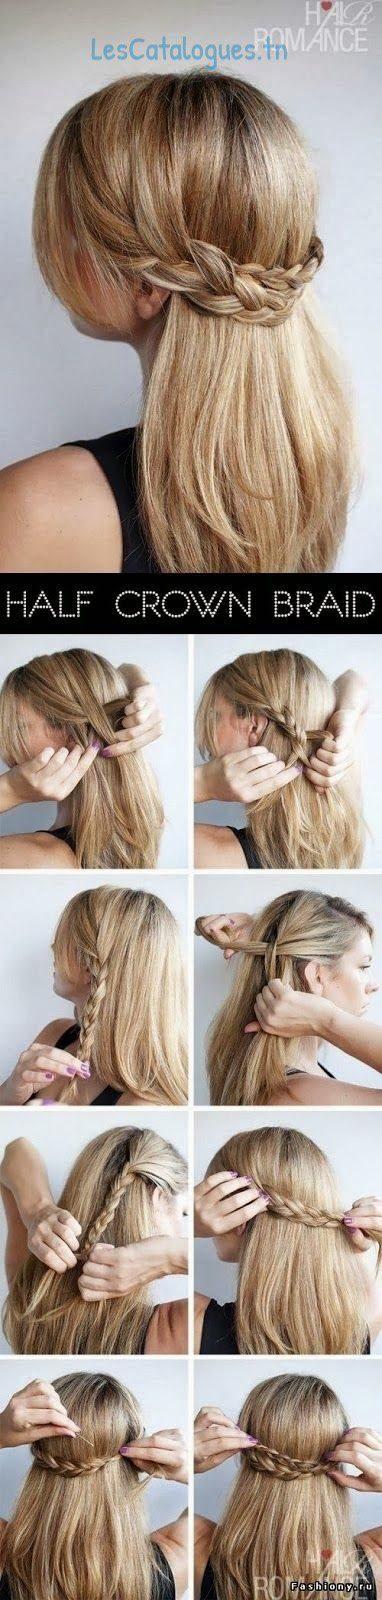 coiffure-cheveux-3